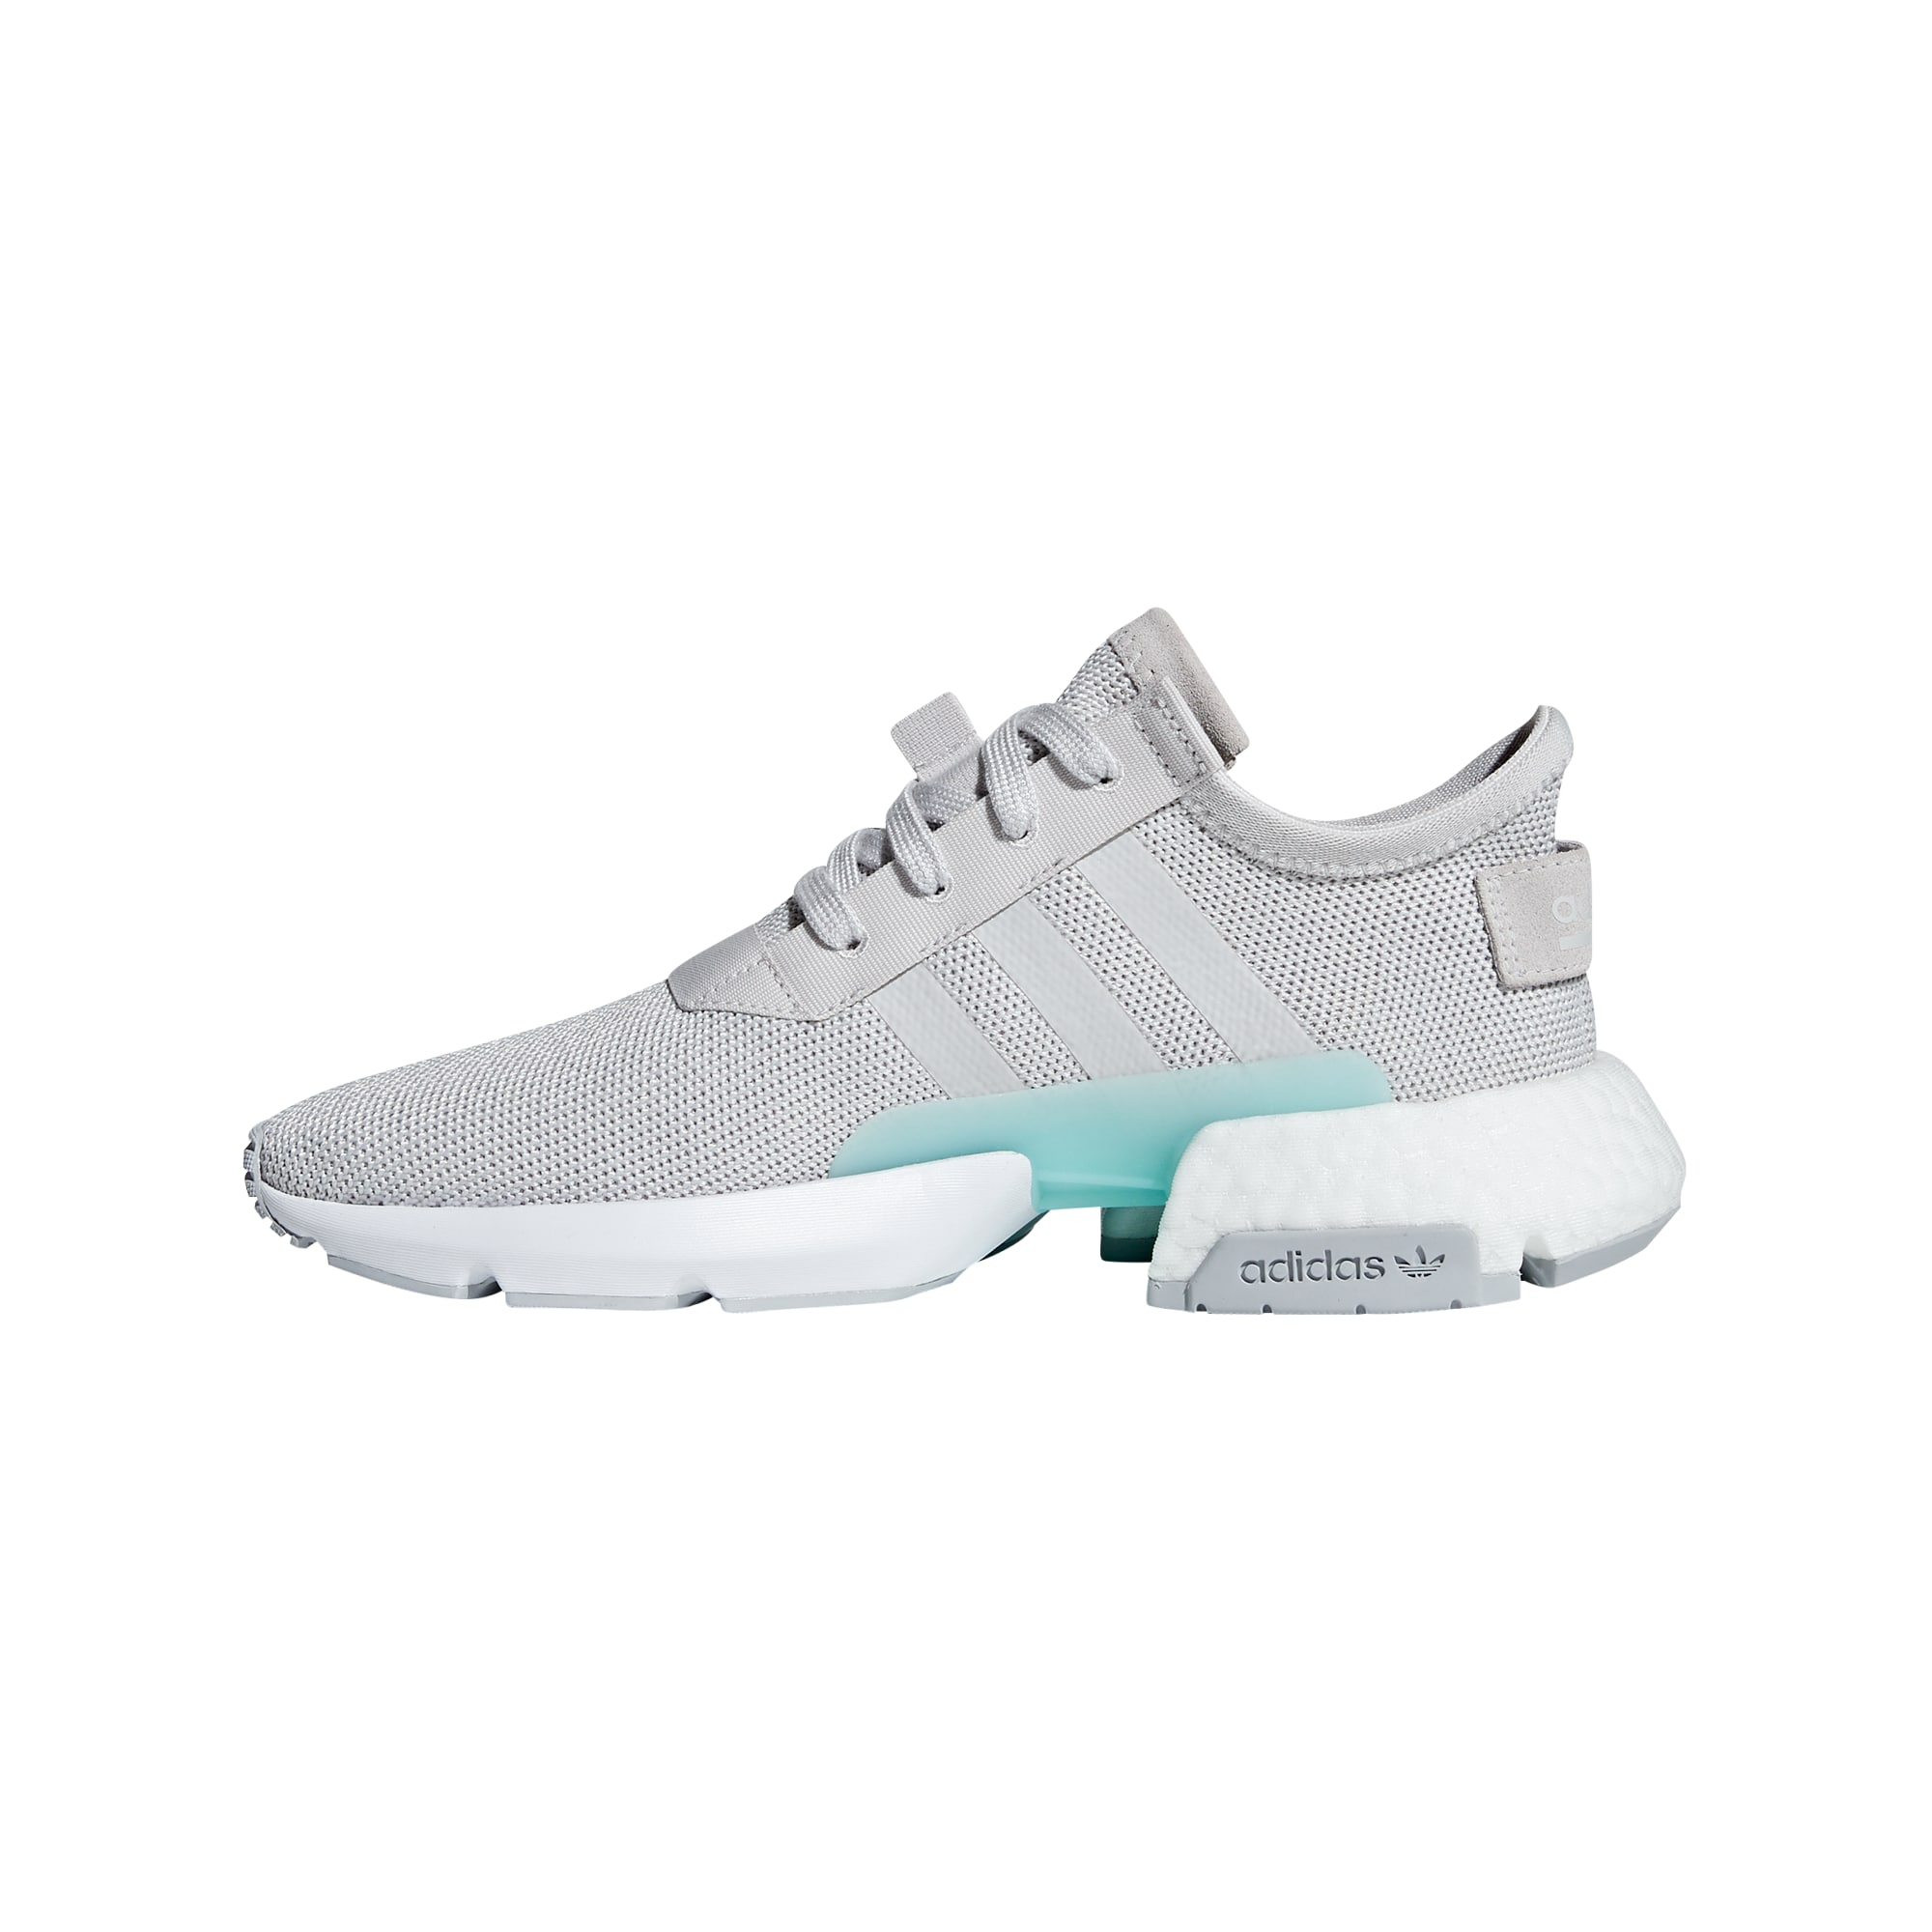 ADIDAS ORIGINALS, Dames Sneakers laag 'POD-S3.1 W', turquoise / grijs